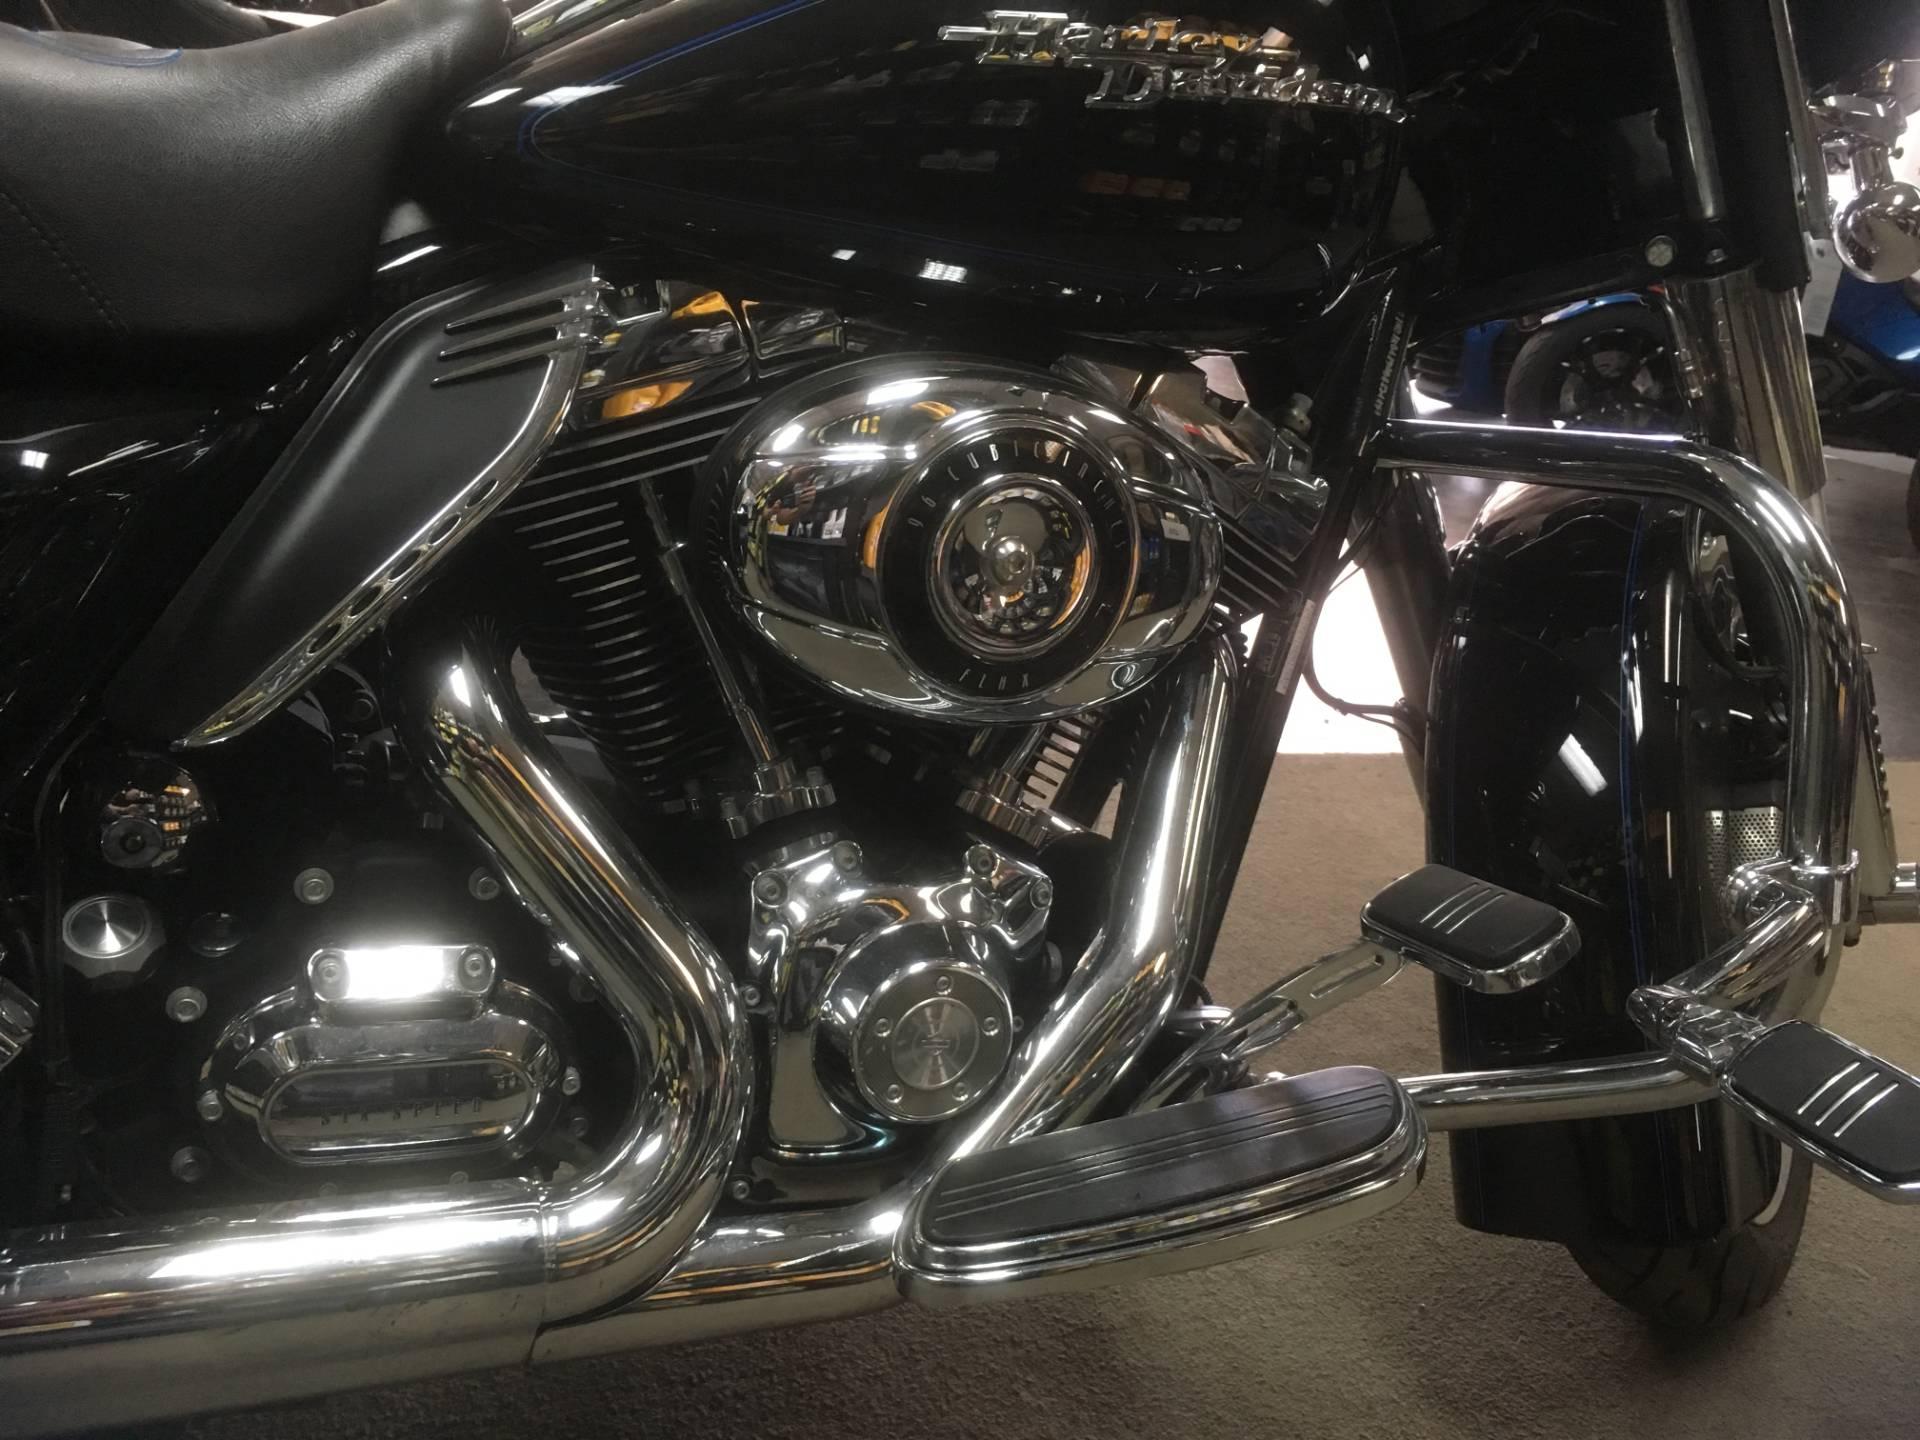 2010 Harley-Davidson FLHX STREET GLIDE 6